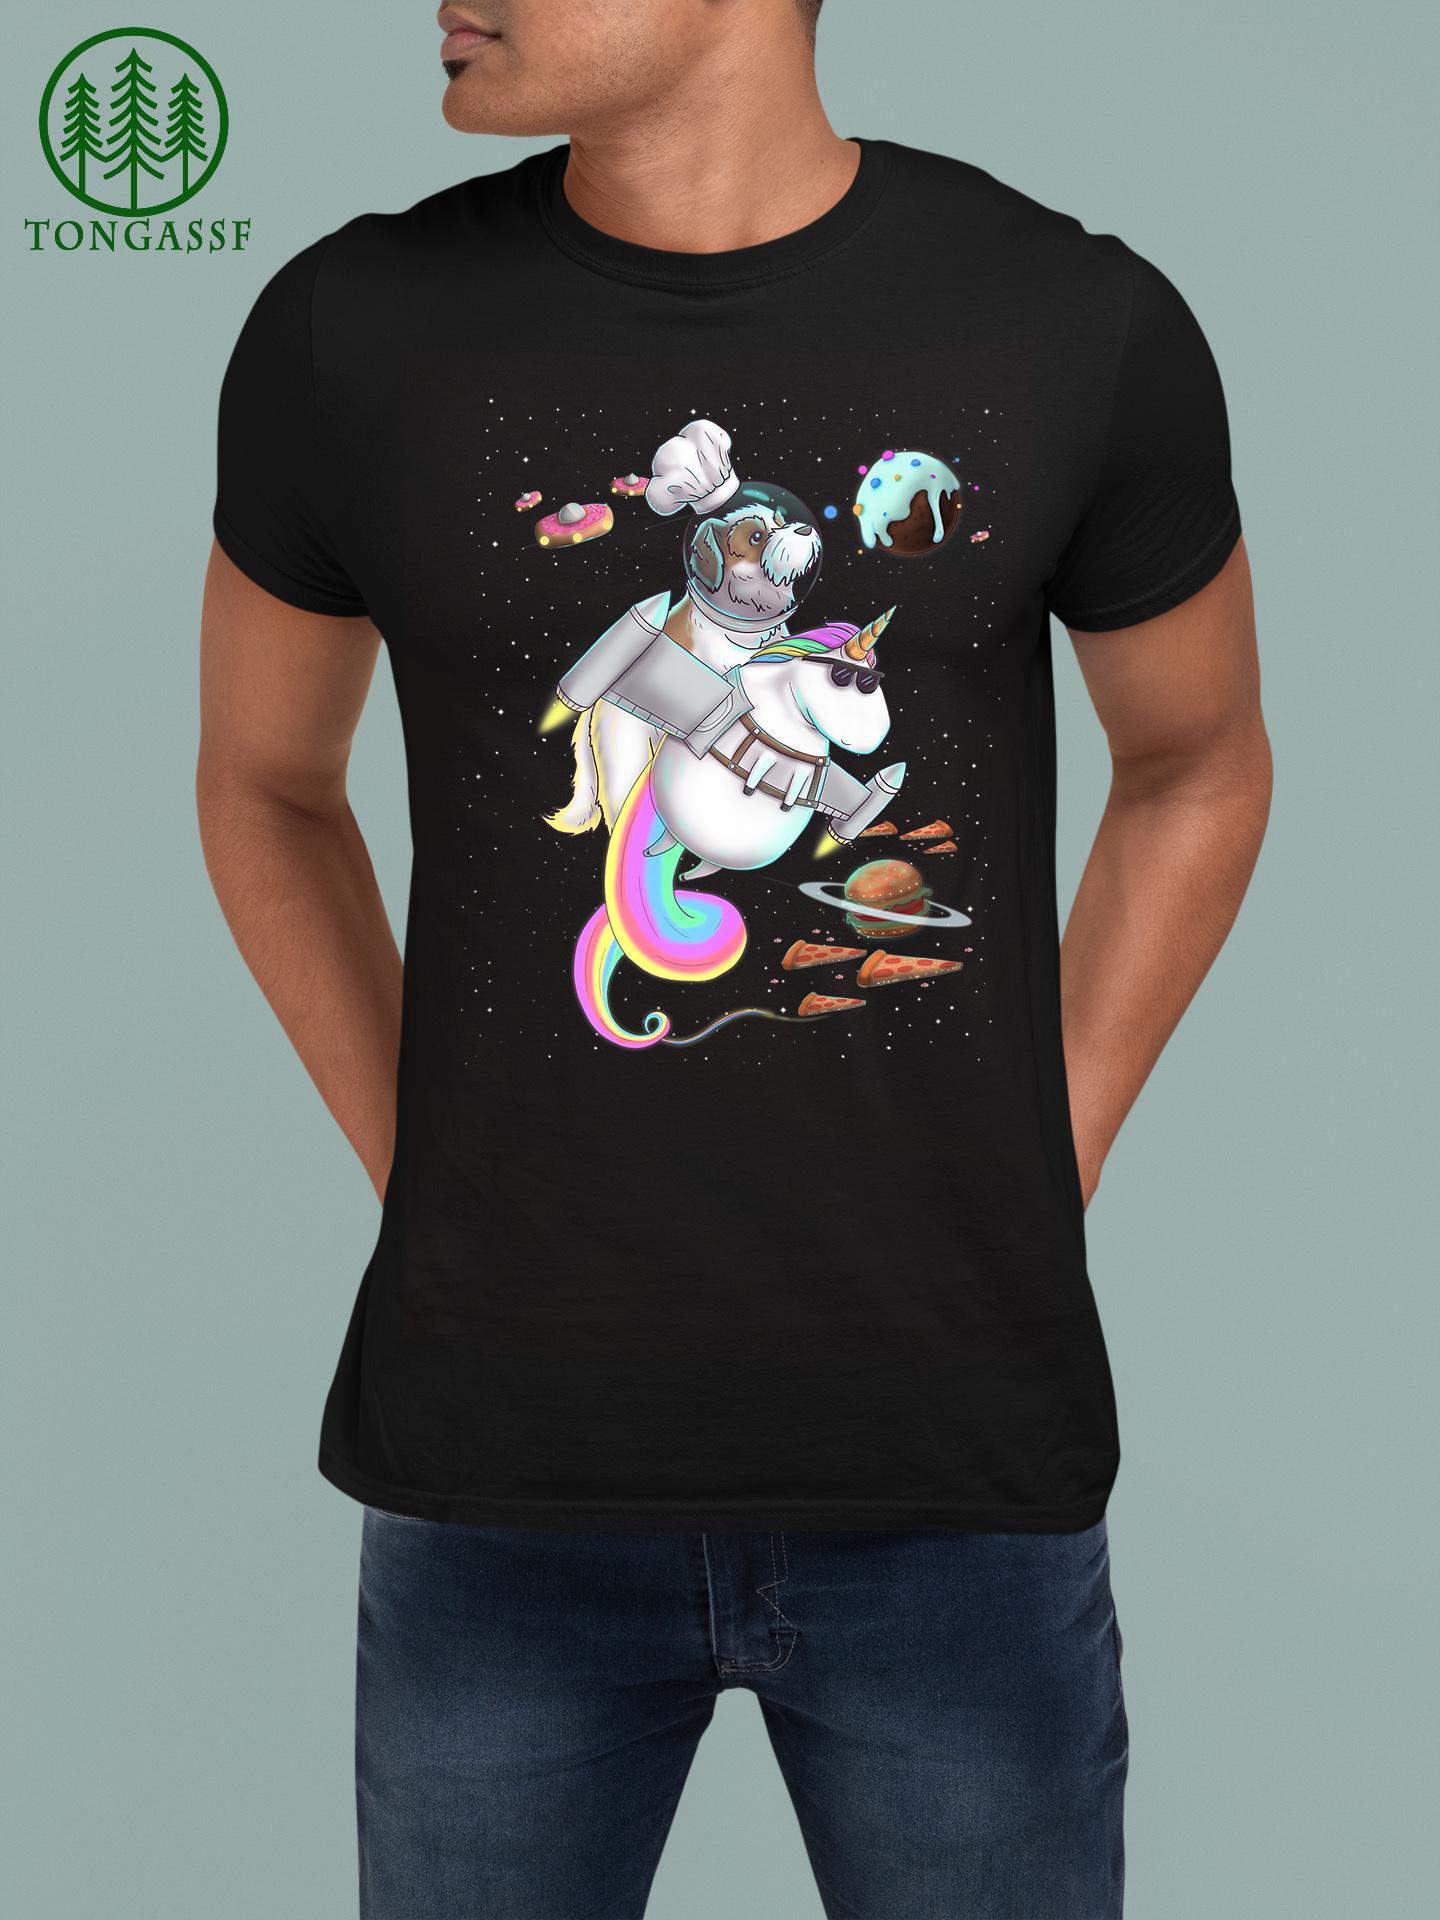 Shih Tzu Dog Riding Unicorn Food Pizza Space Party Planet Premium T Shirt